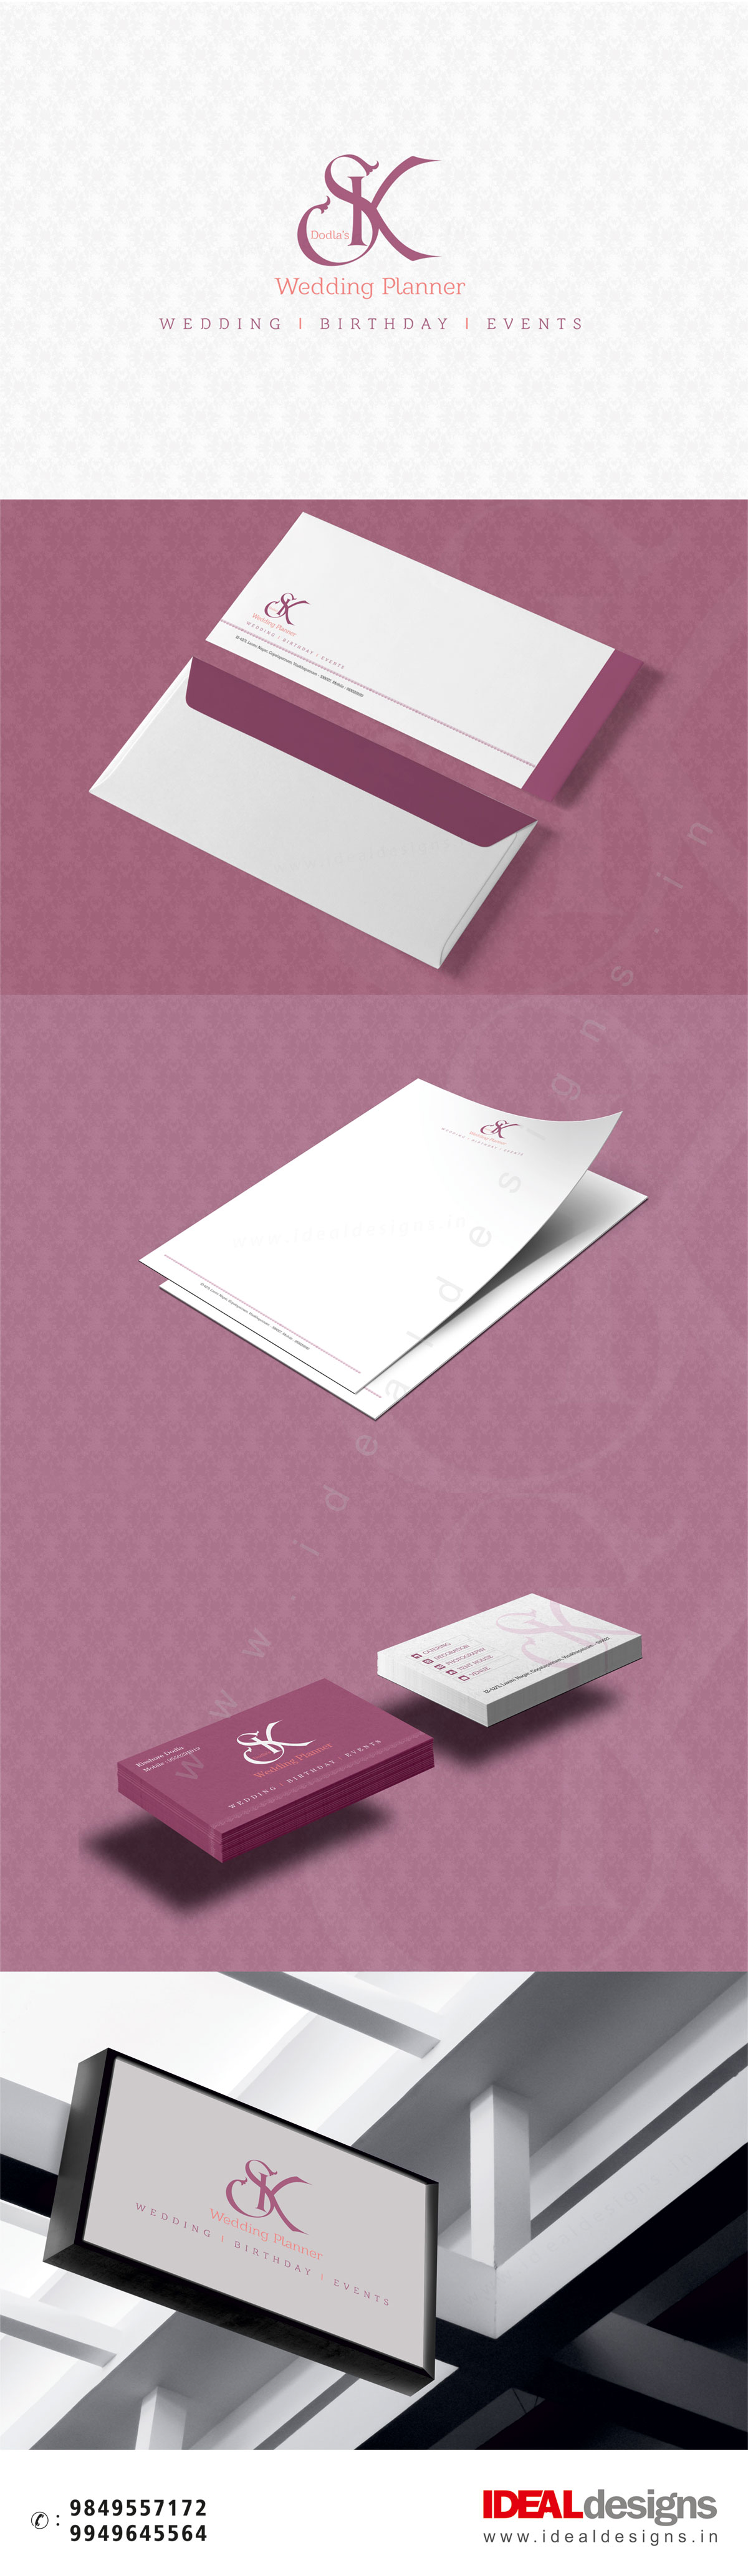 Professional Designers, Event Logo Design CompanyWeb Developers India, Web Designers India, Best Brochure Design Company Offers Brochure Design Services